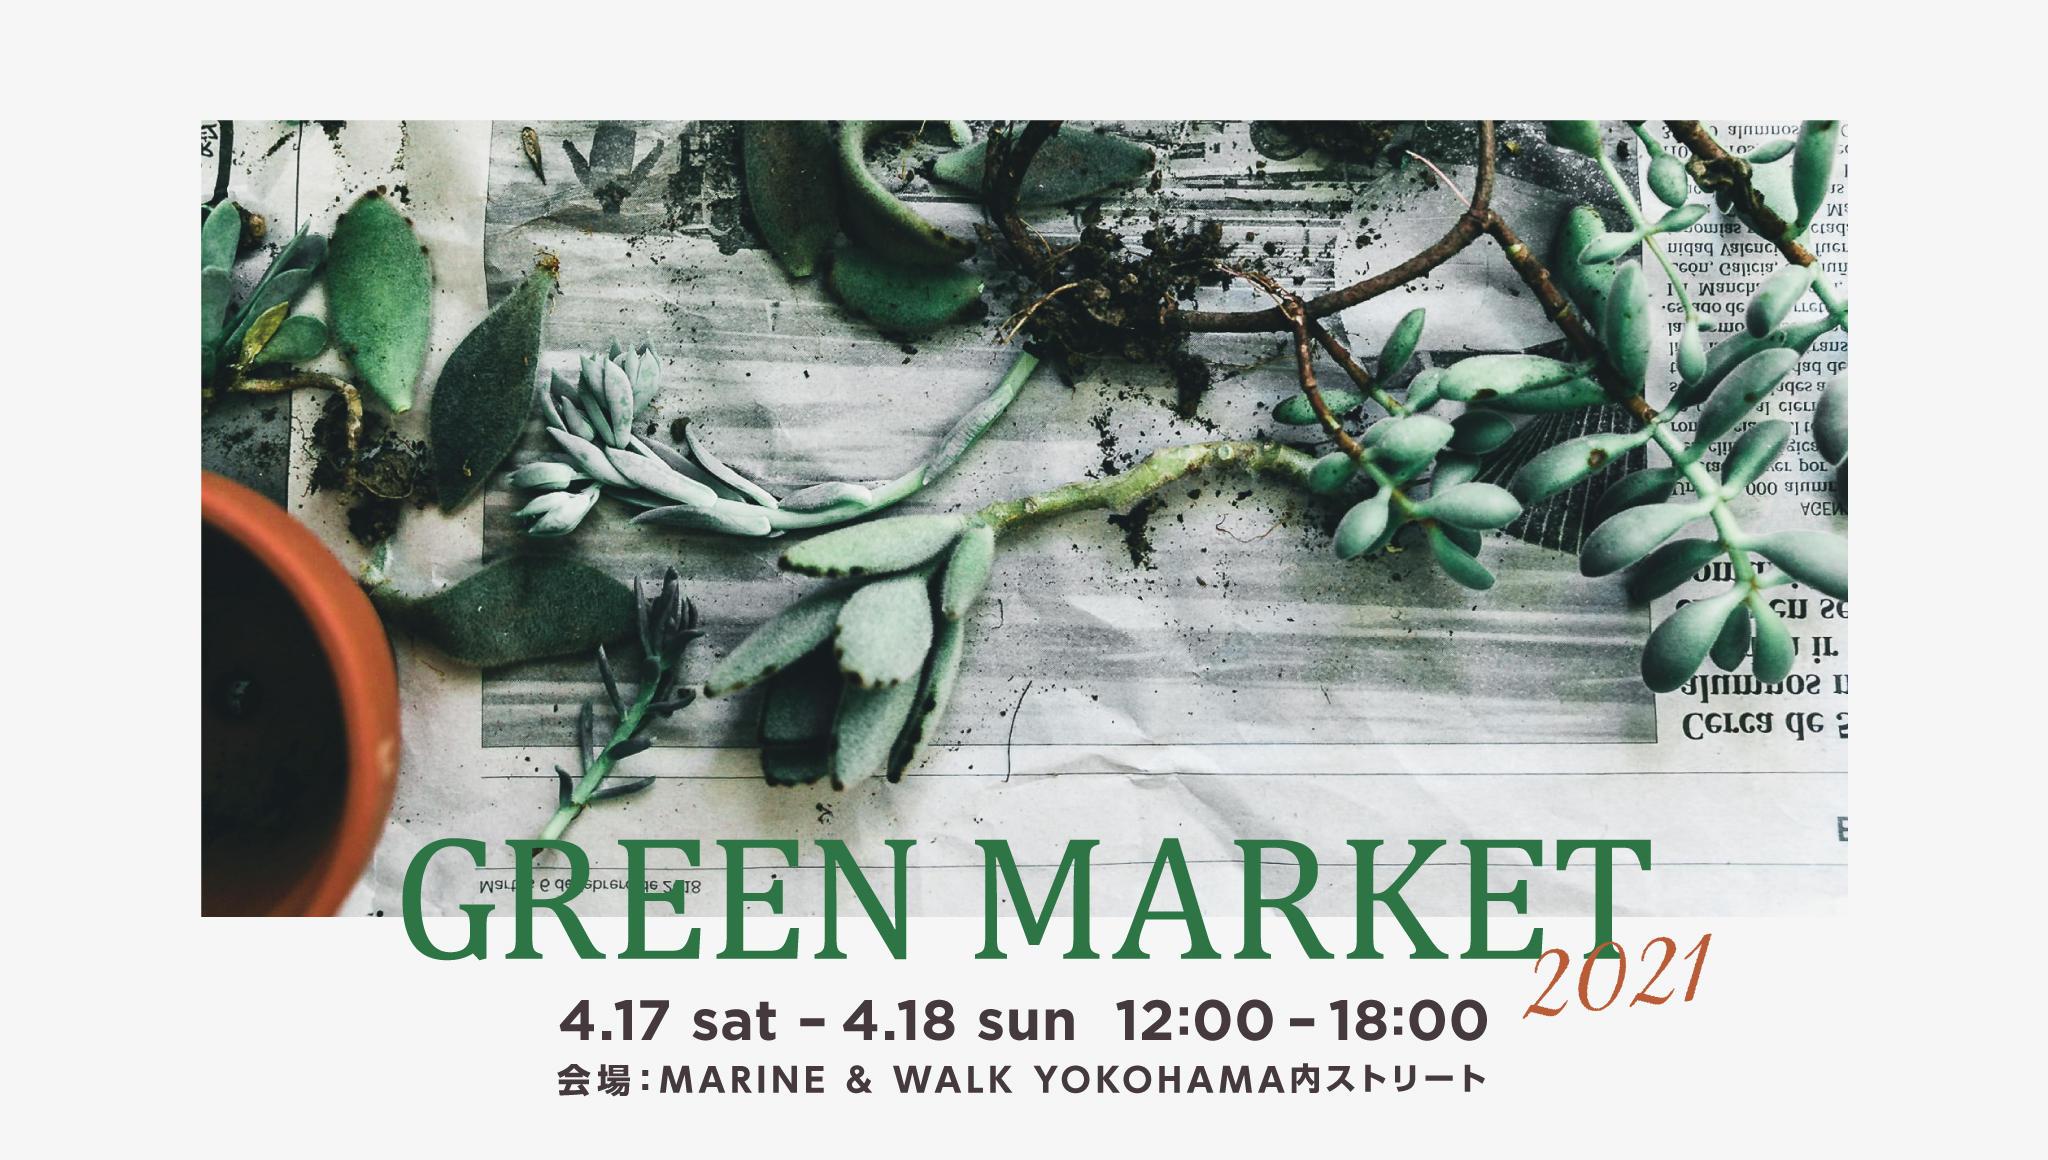 GREEN MARKET 2021.4.24 sat - 4.25 sun 開催!